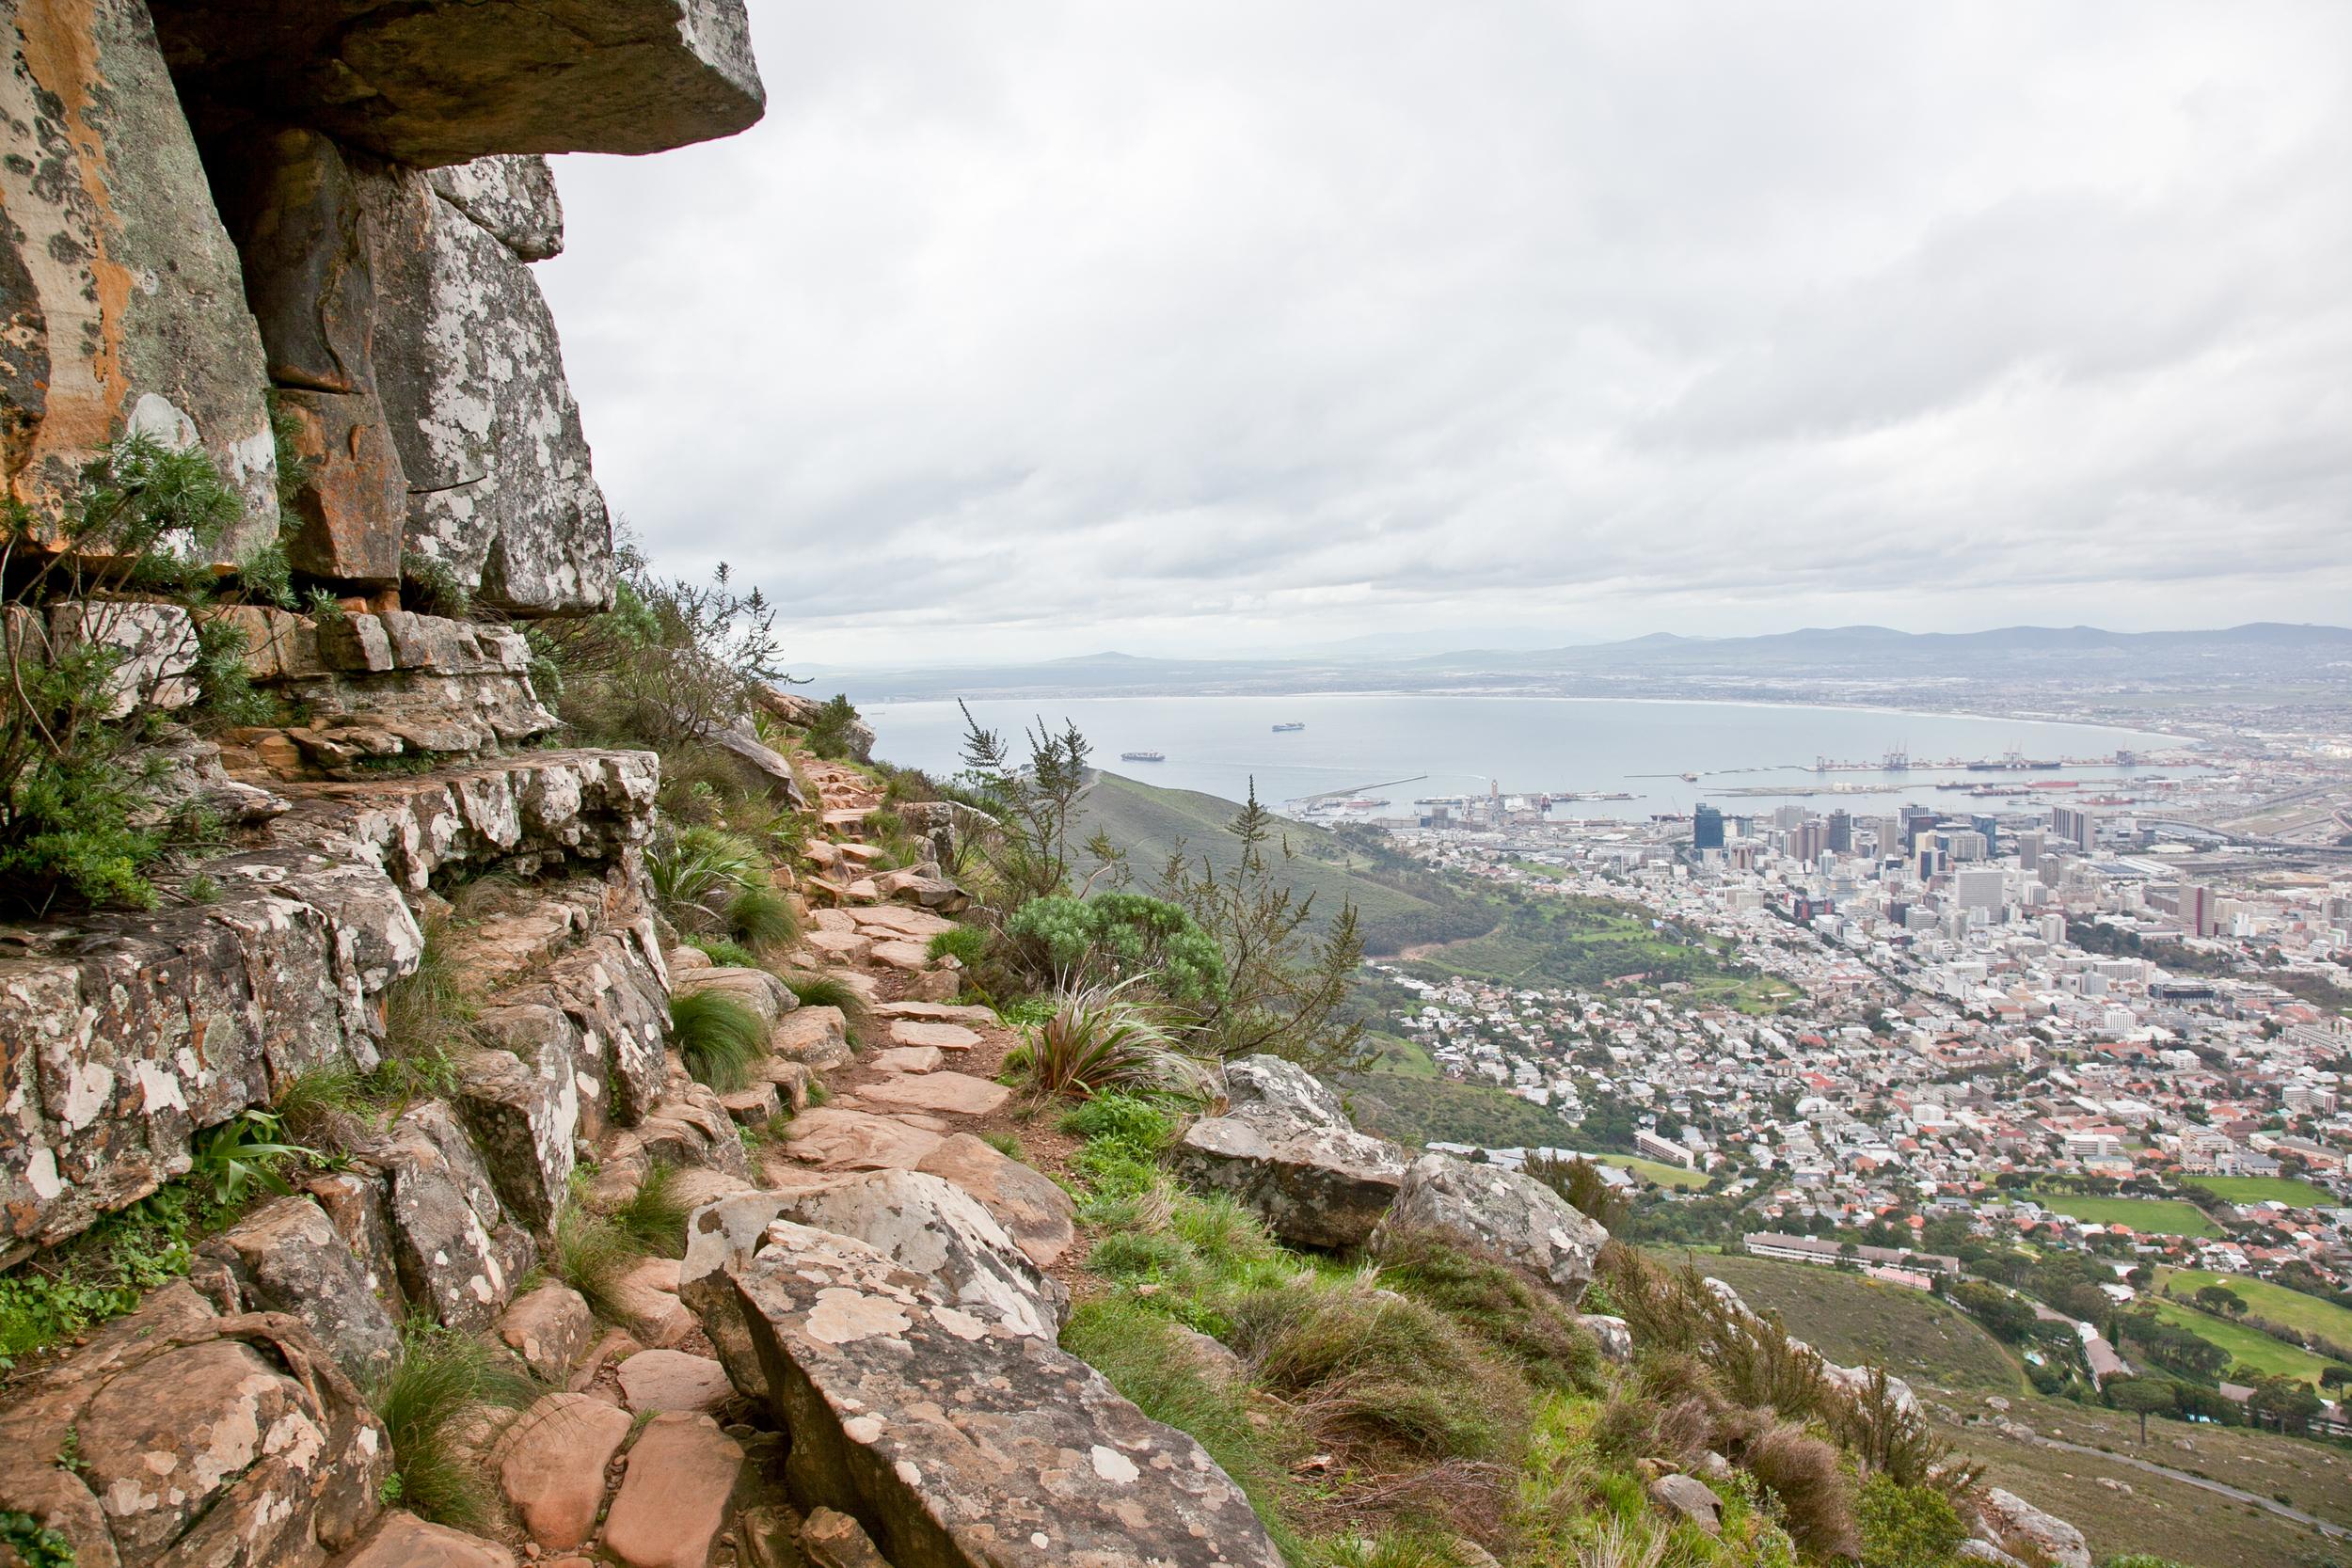 IMG_5048-hiking-lions-head-cape-town-trisa-taro.jpg